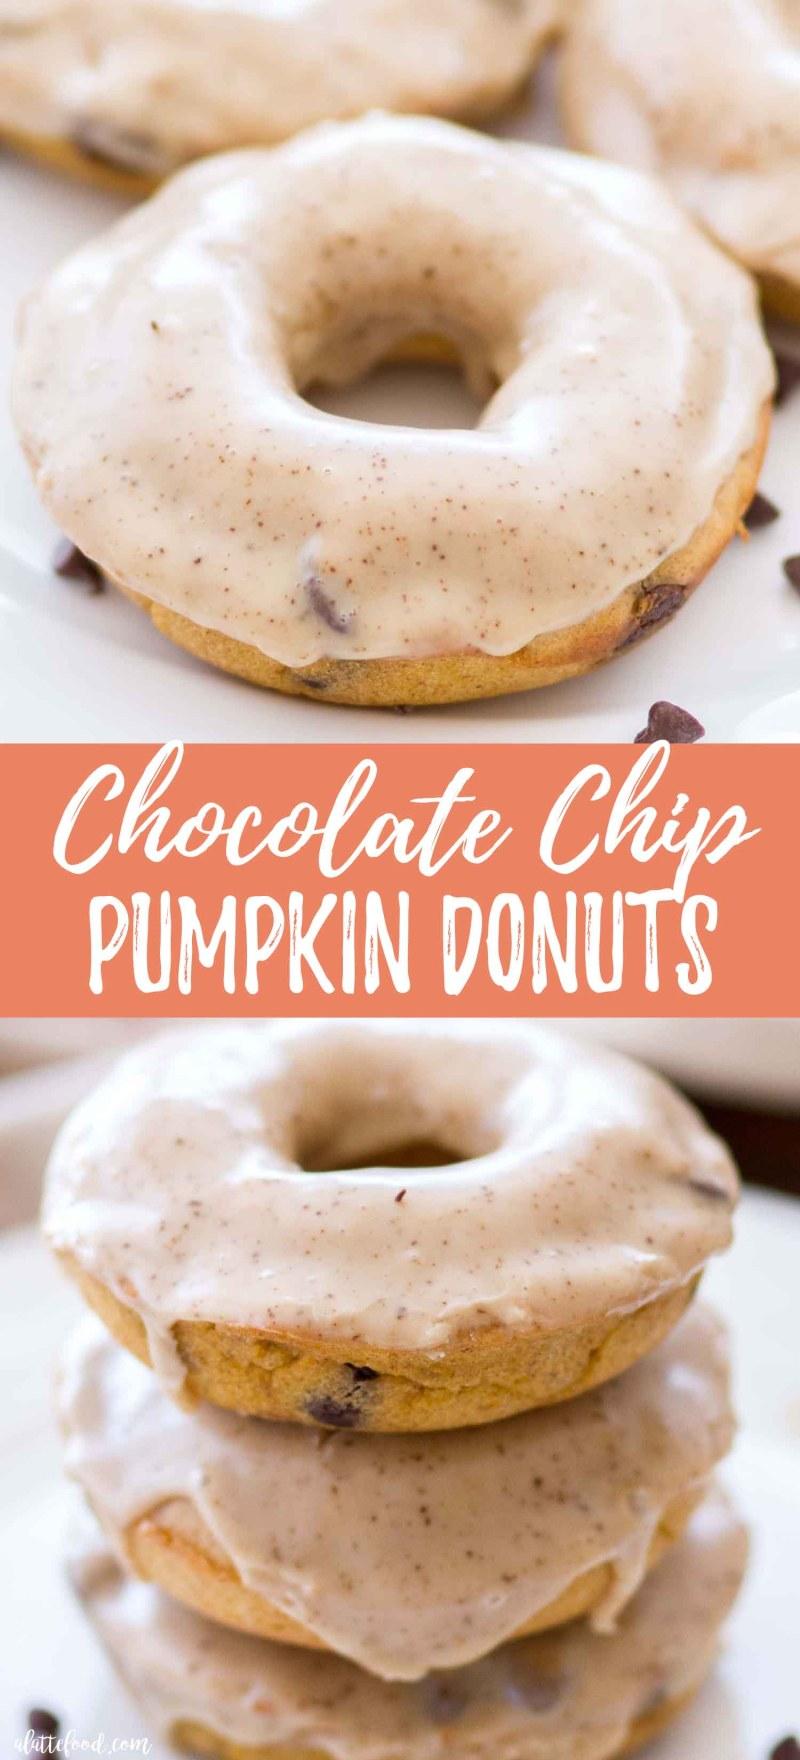 Chocolate Chip Pumpkin Donuts Recipe (baked pumpkin donuts)